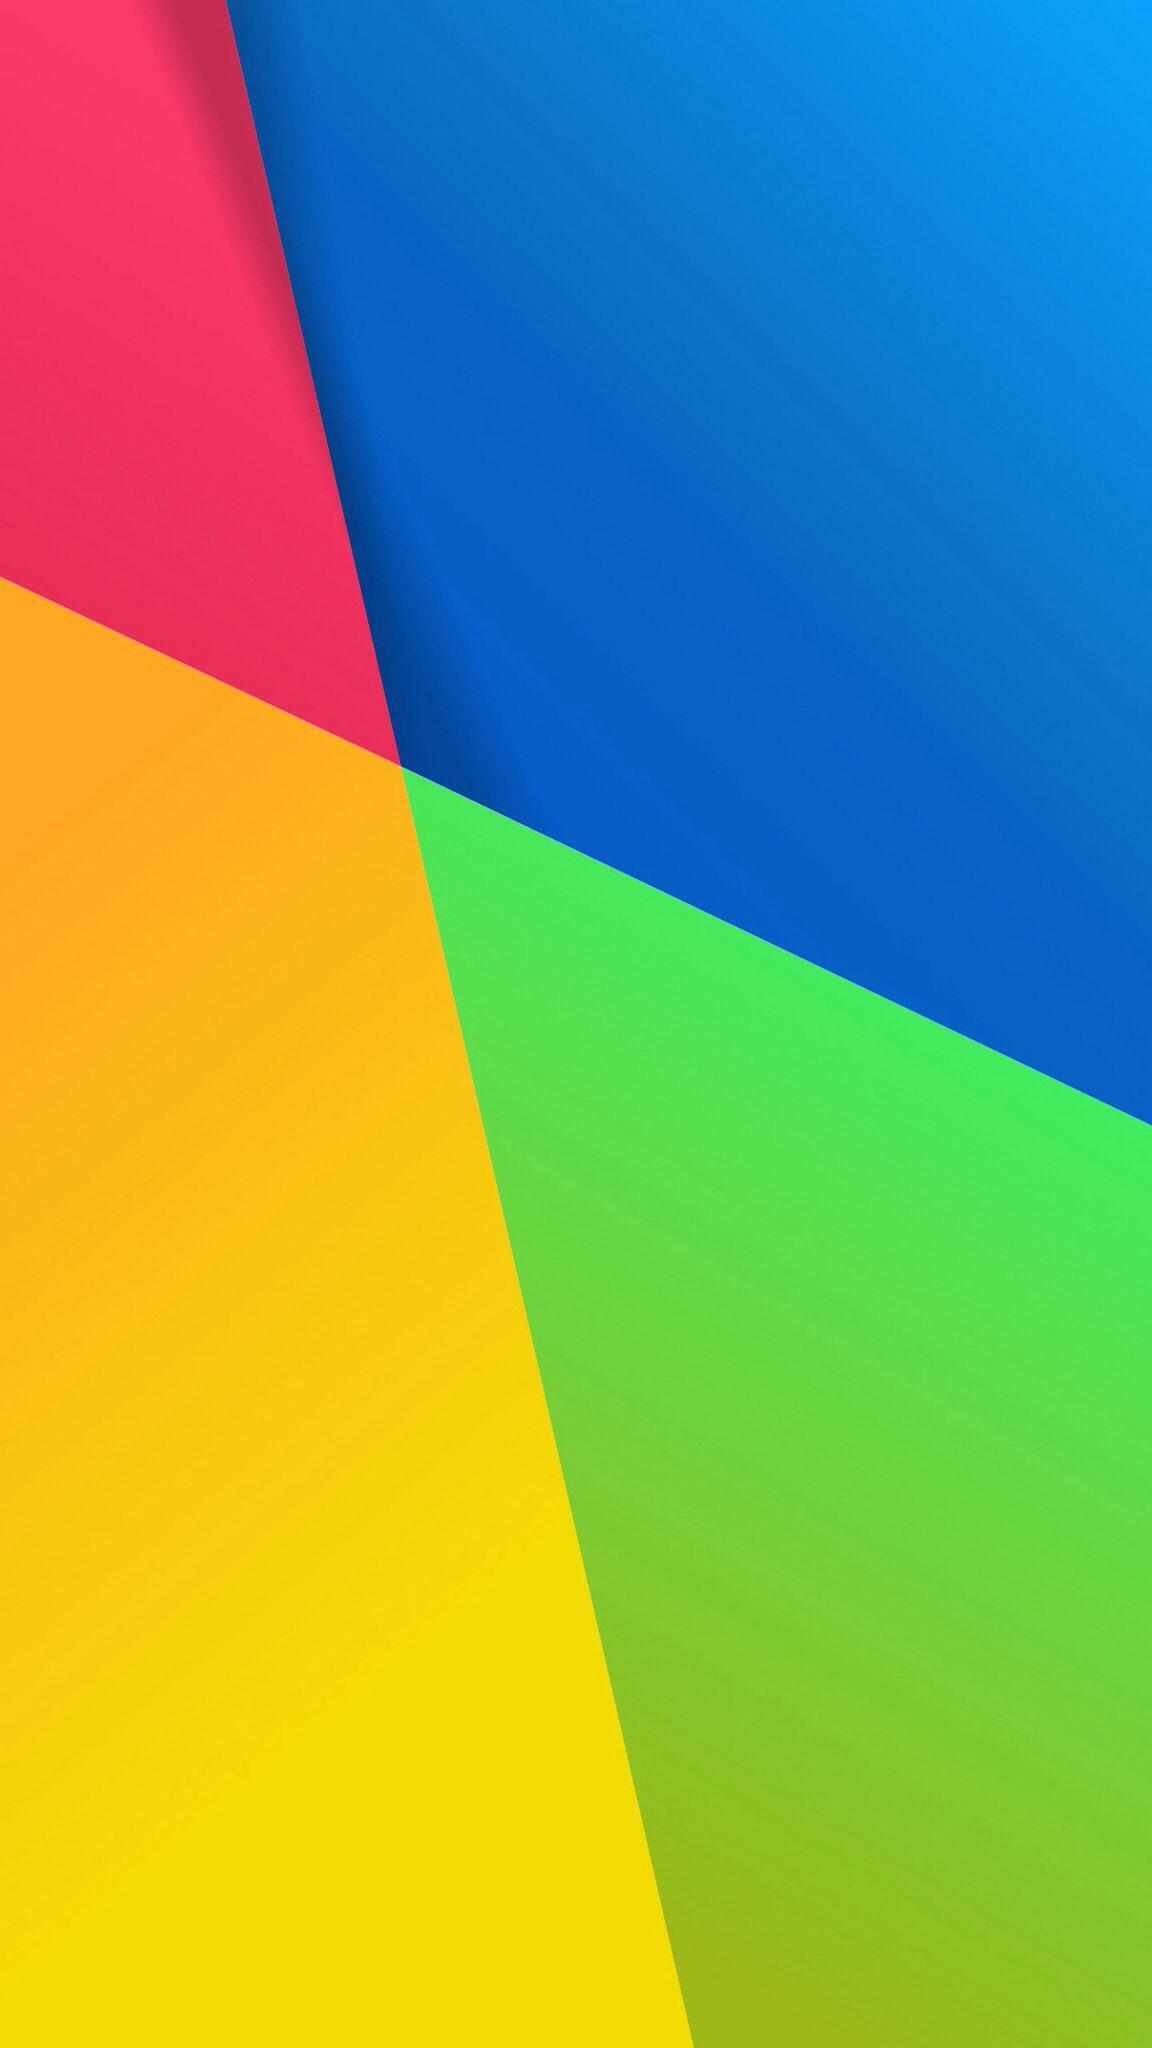 Mobile Version Of The Default Google Nexus 7 Wallpaper I Made In Gimp The Resolution Is 1440x2560 At 300ppi Enjoy Duvar Kagitlari Duvar